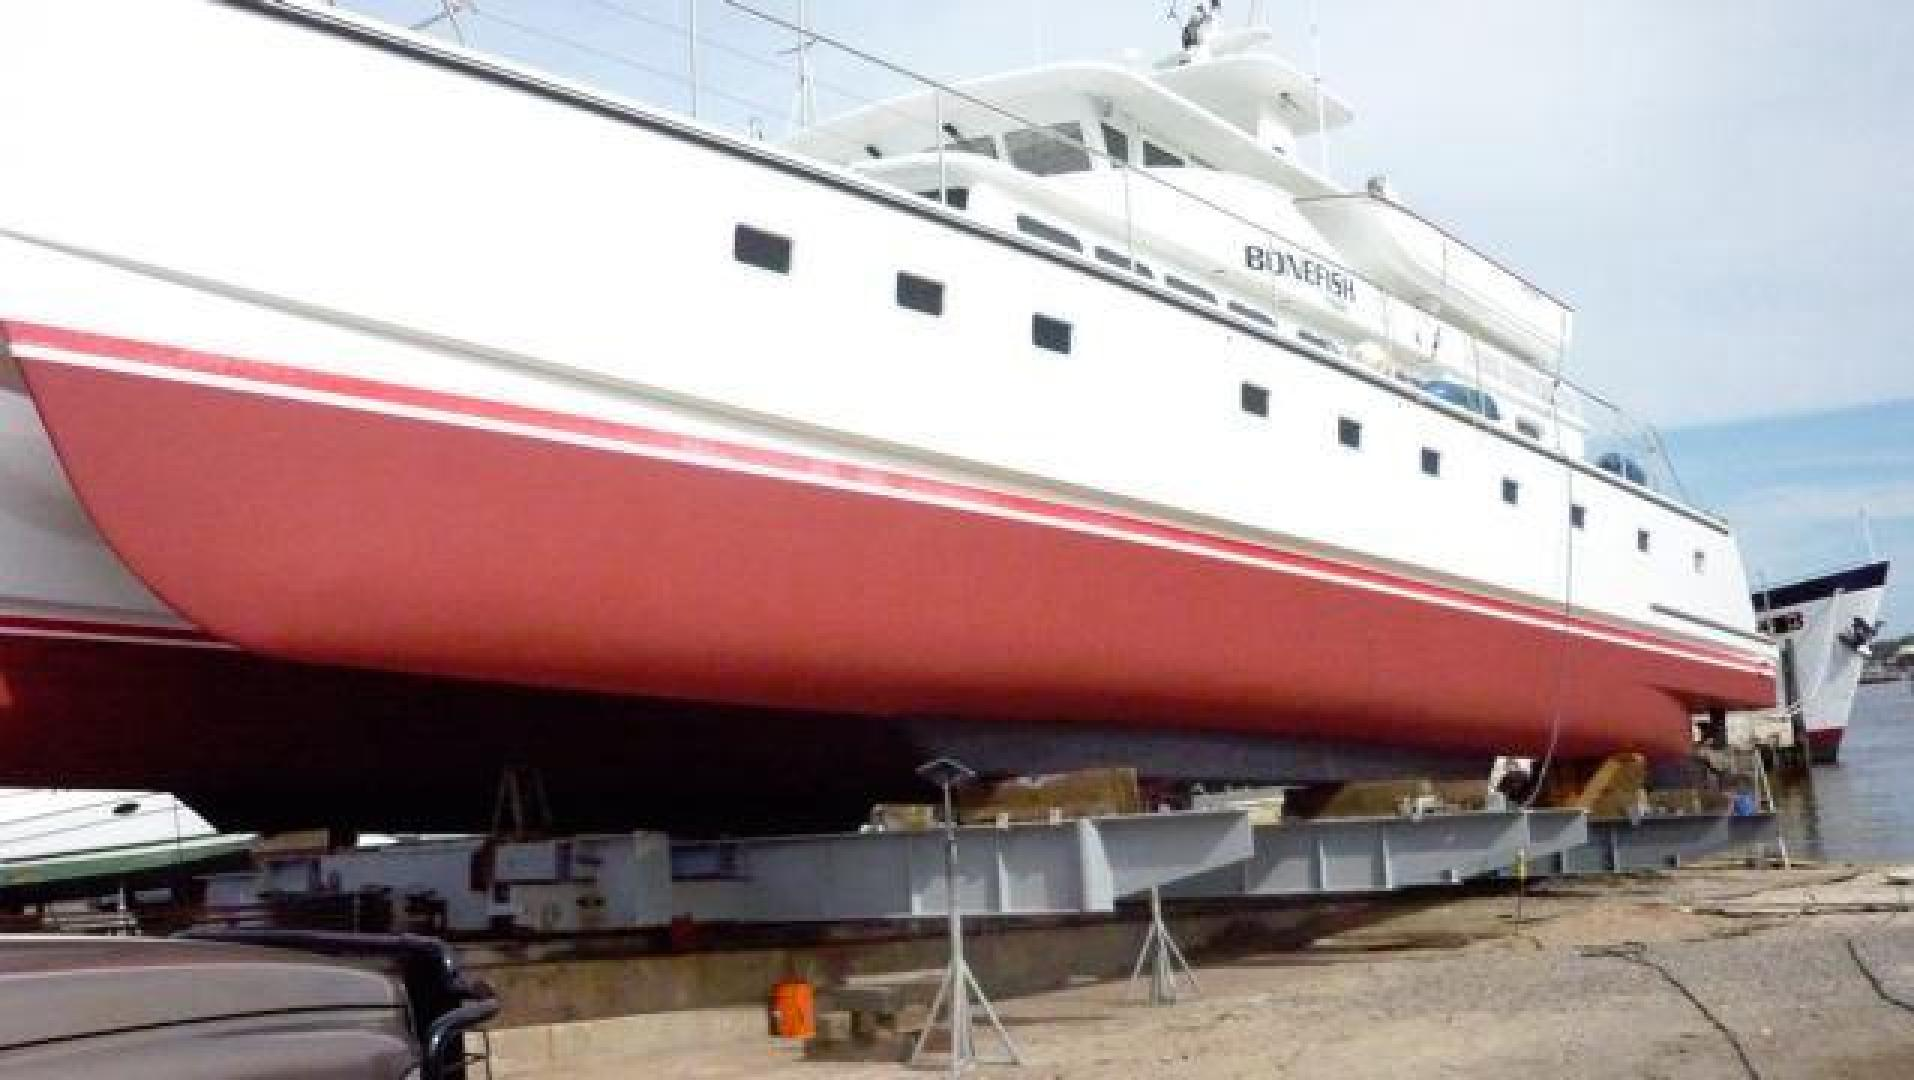 Custom-Catamaran 2009-Bonefish Brunswick-Georgia-United States-3/16/2015 New bottom paint on Bonefish completed 3/12-610052 | Thumbnail